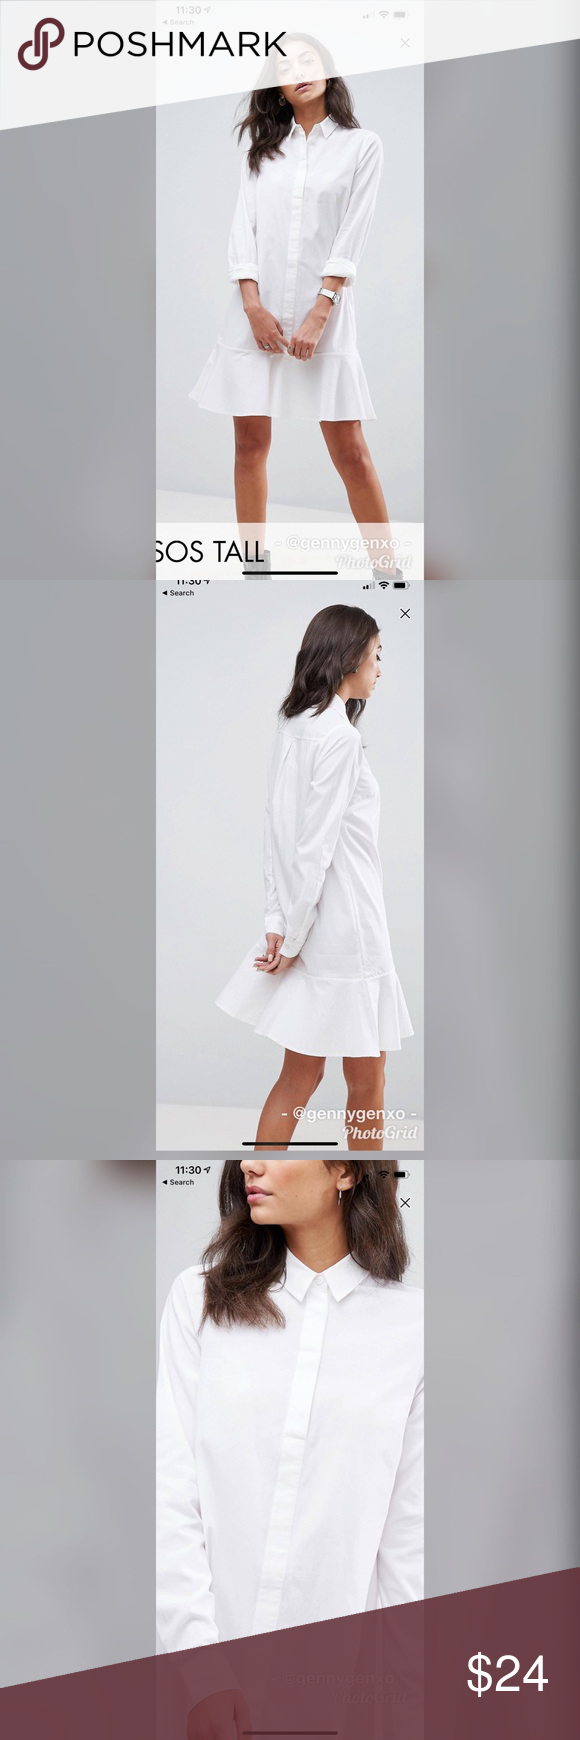 0905e544b7f ASOS Tall Peplum Mini Shirt Dress ASOS Tall White Shirt Dress w  peplum hem  skirt